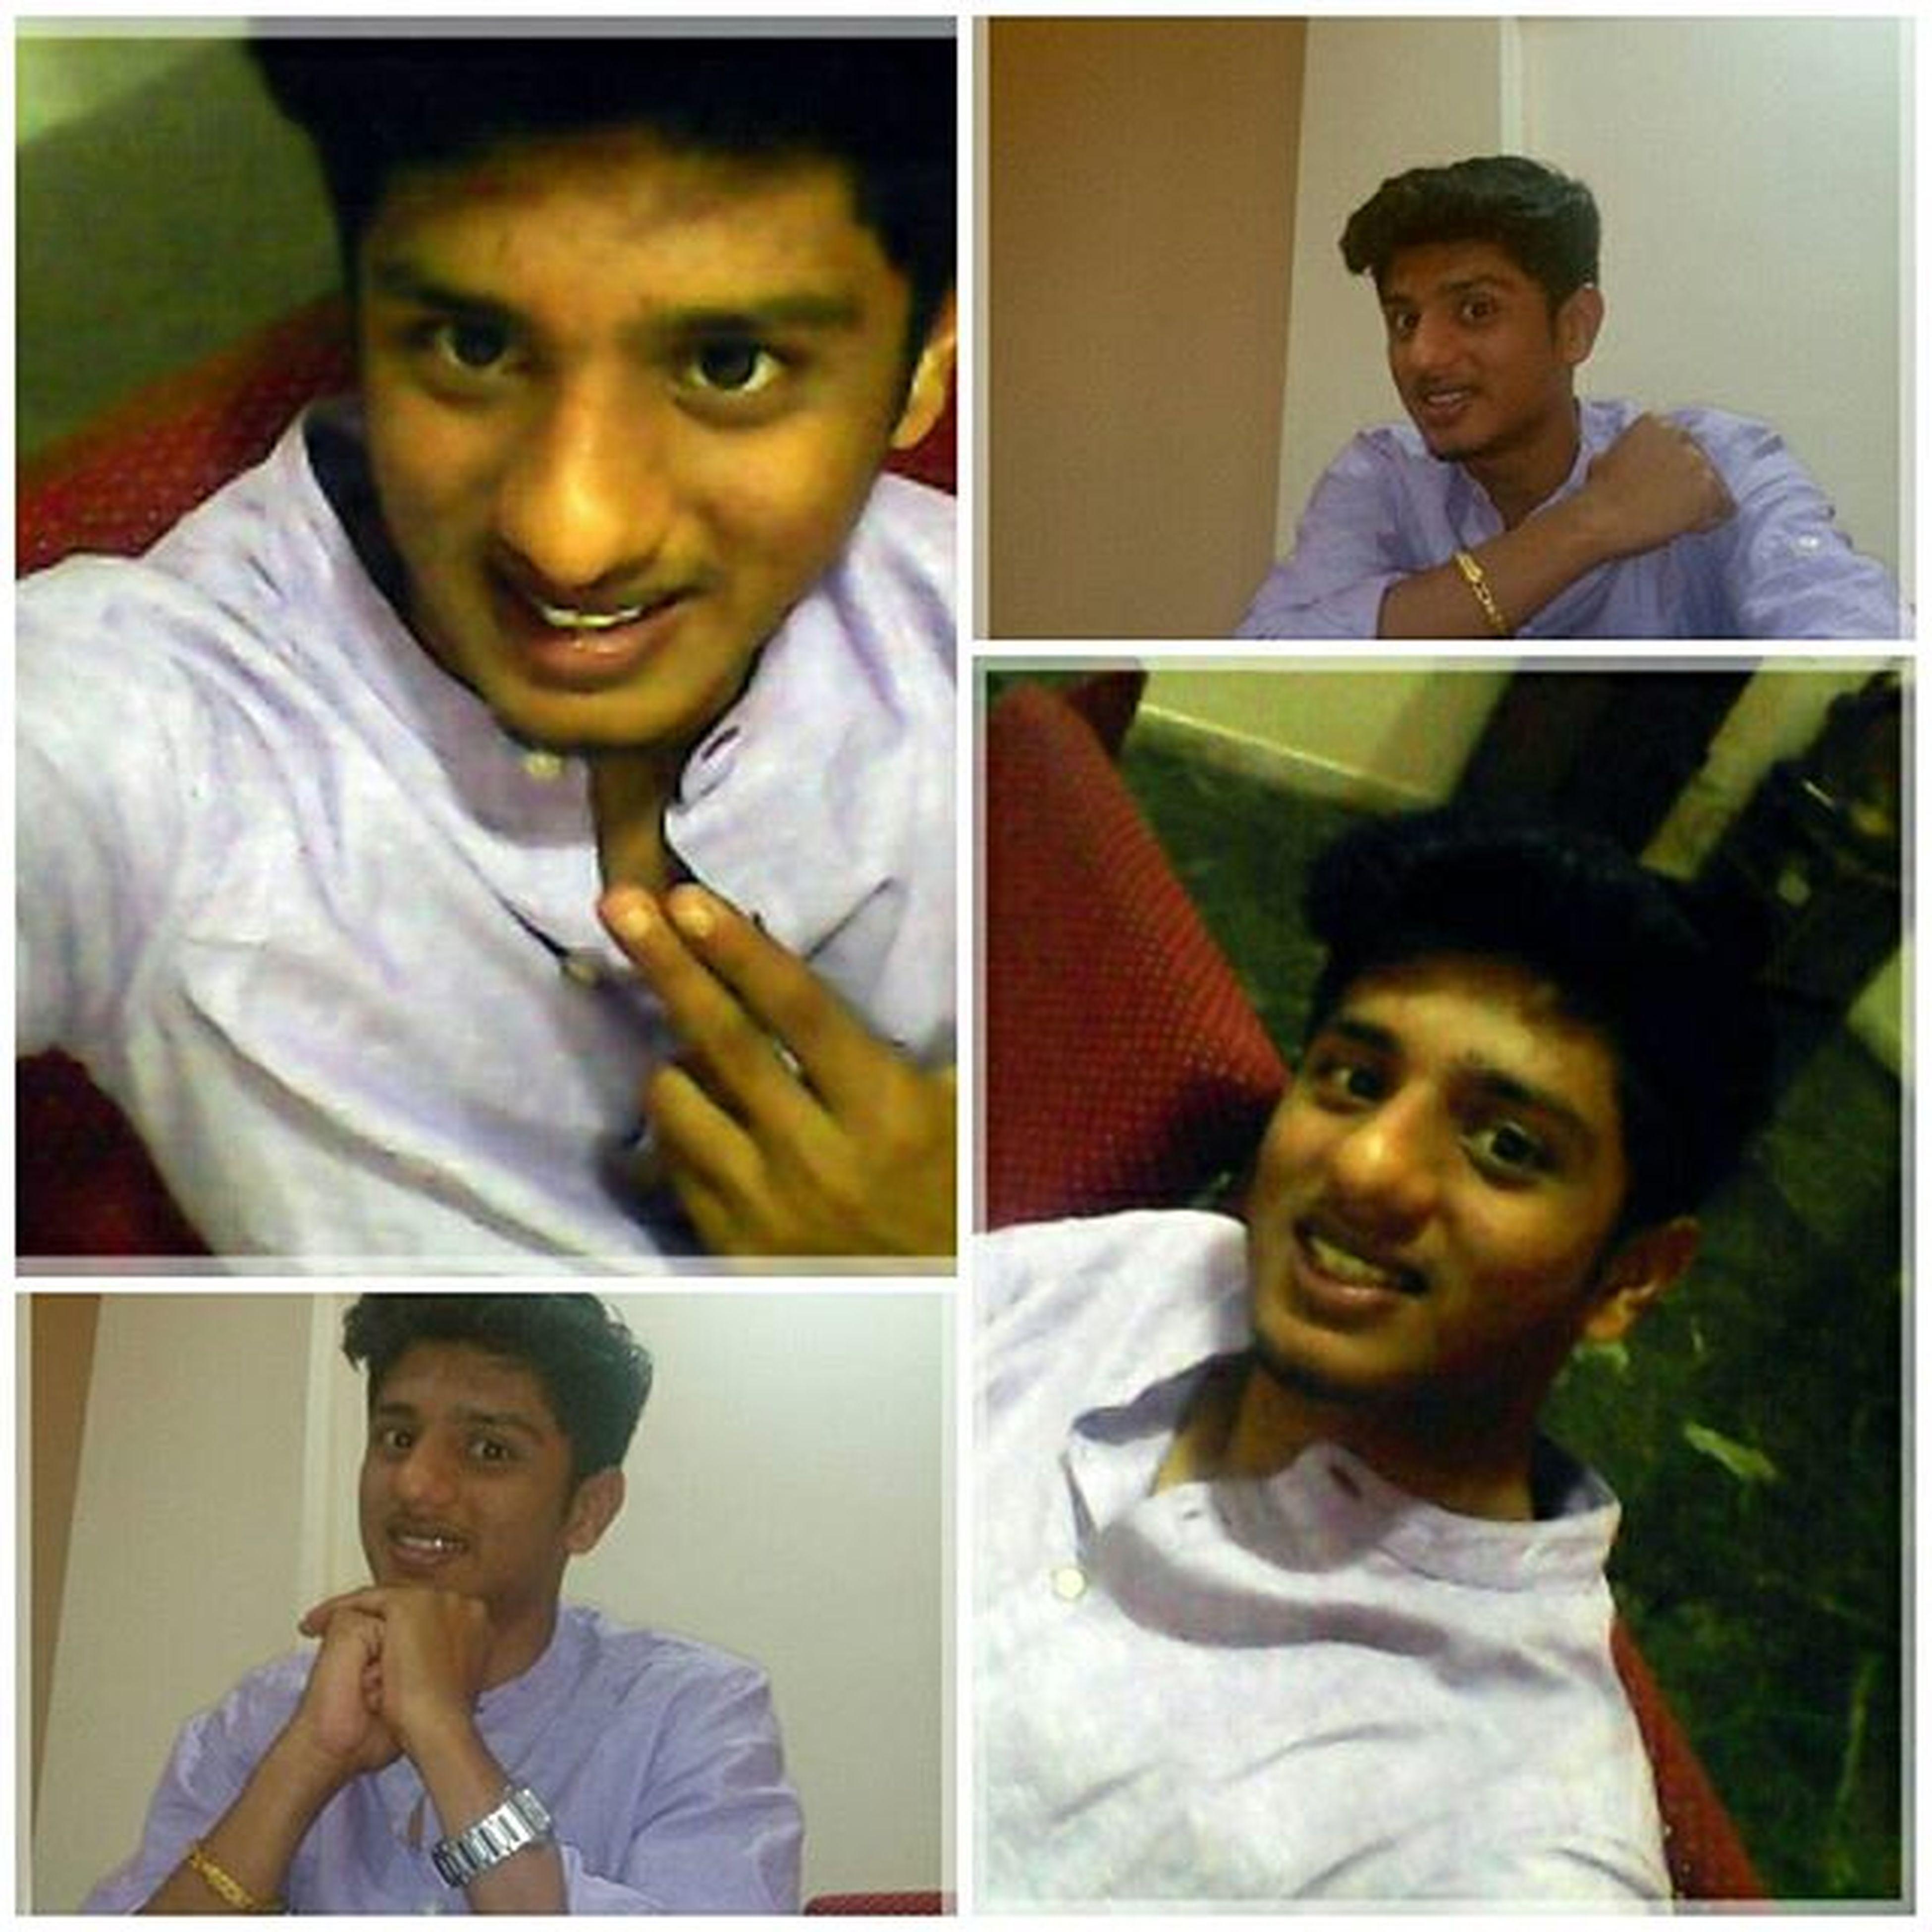 HaPPy_Diwali 🎆🎆🎆🎇🎇🎇🎆🎆🎆 Random_clicks 📱📱📱📱 Diwali_Night 🎊🎉🎁🎁🎁🎉🎊 😘😘😘😘😘😘😘😘😘😘😘😘 😇😇😇😇😇😇😇😇😇😇😇😇